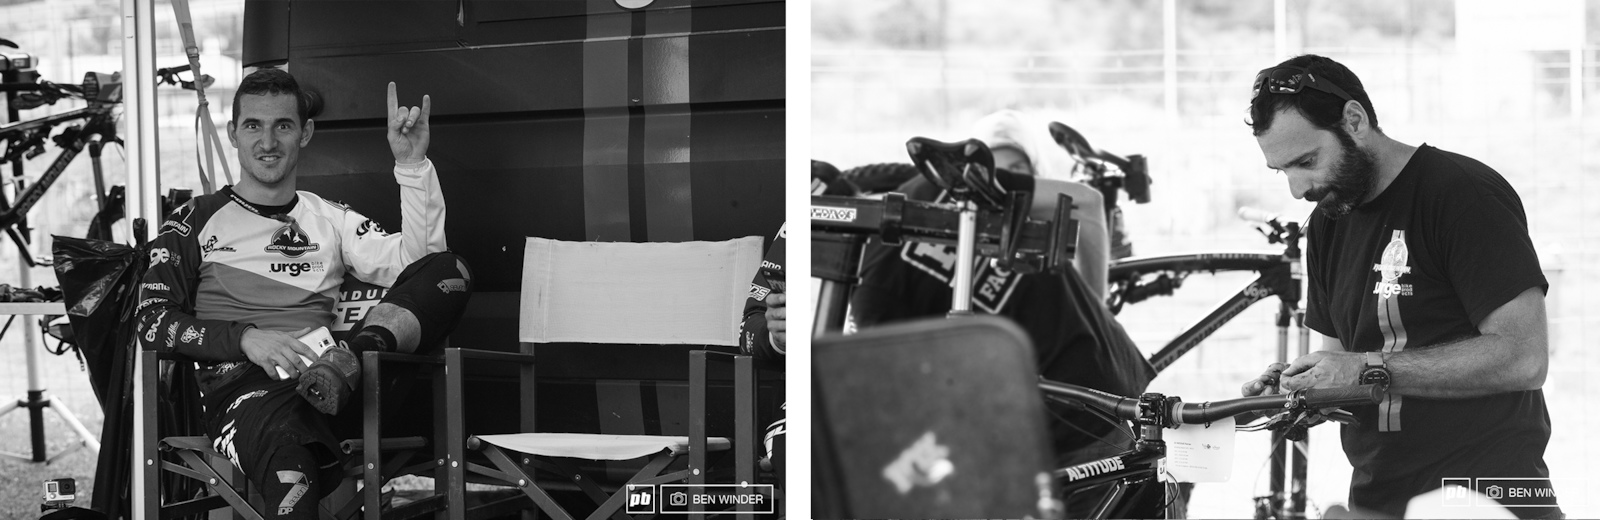 2016 French Enduro Series Round 3 - Millau Saturday Practice